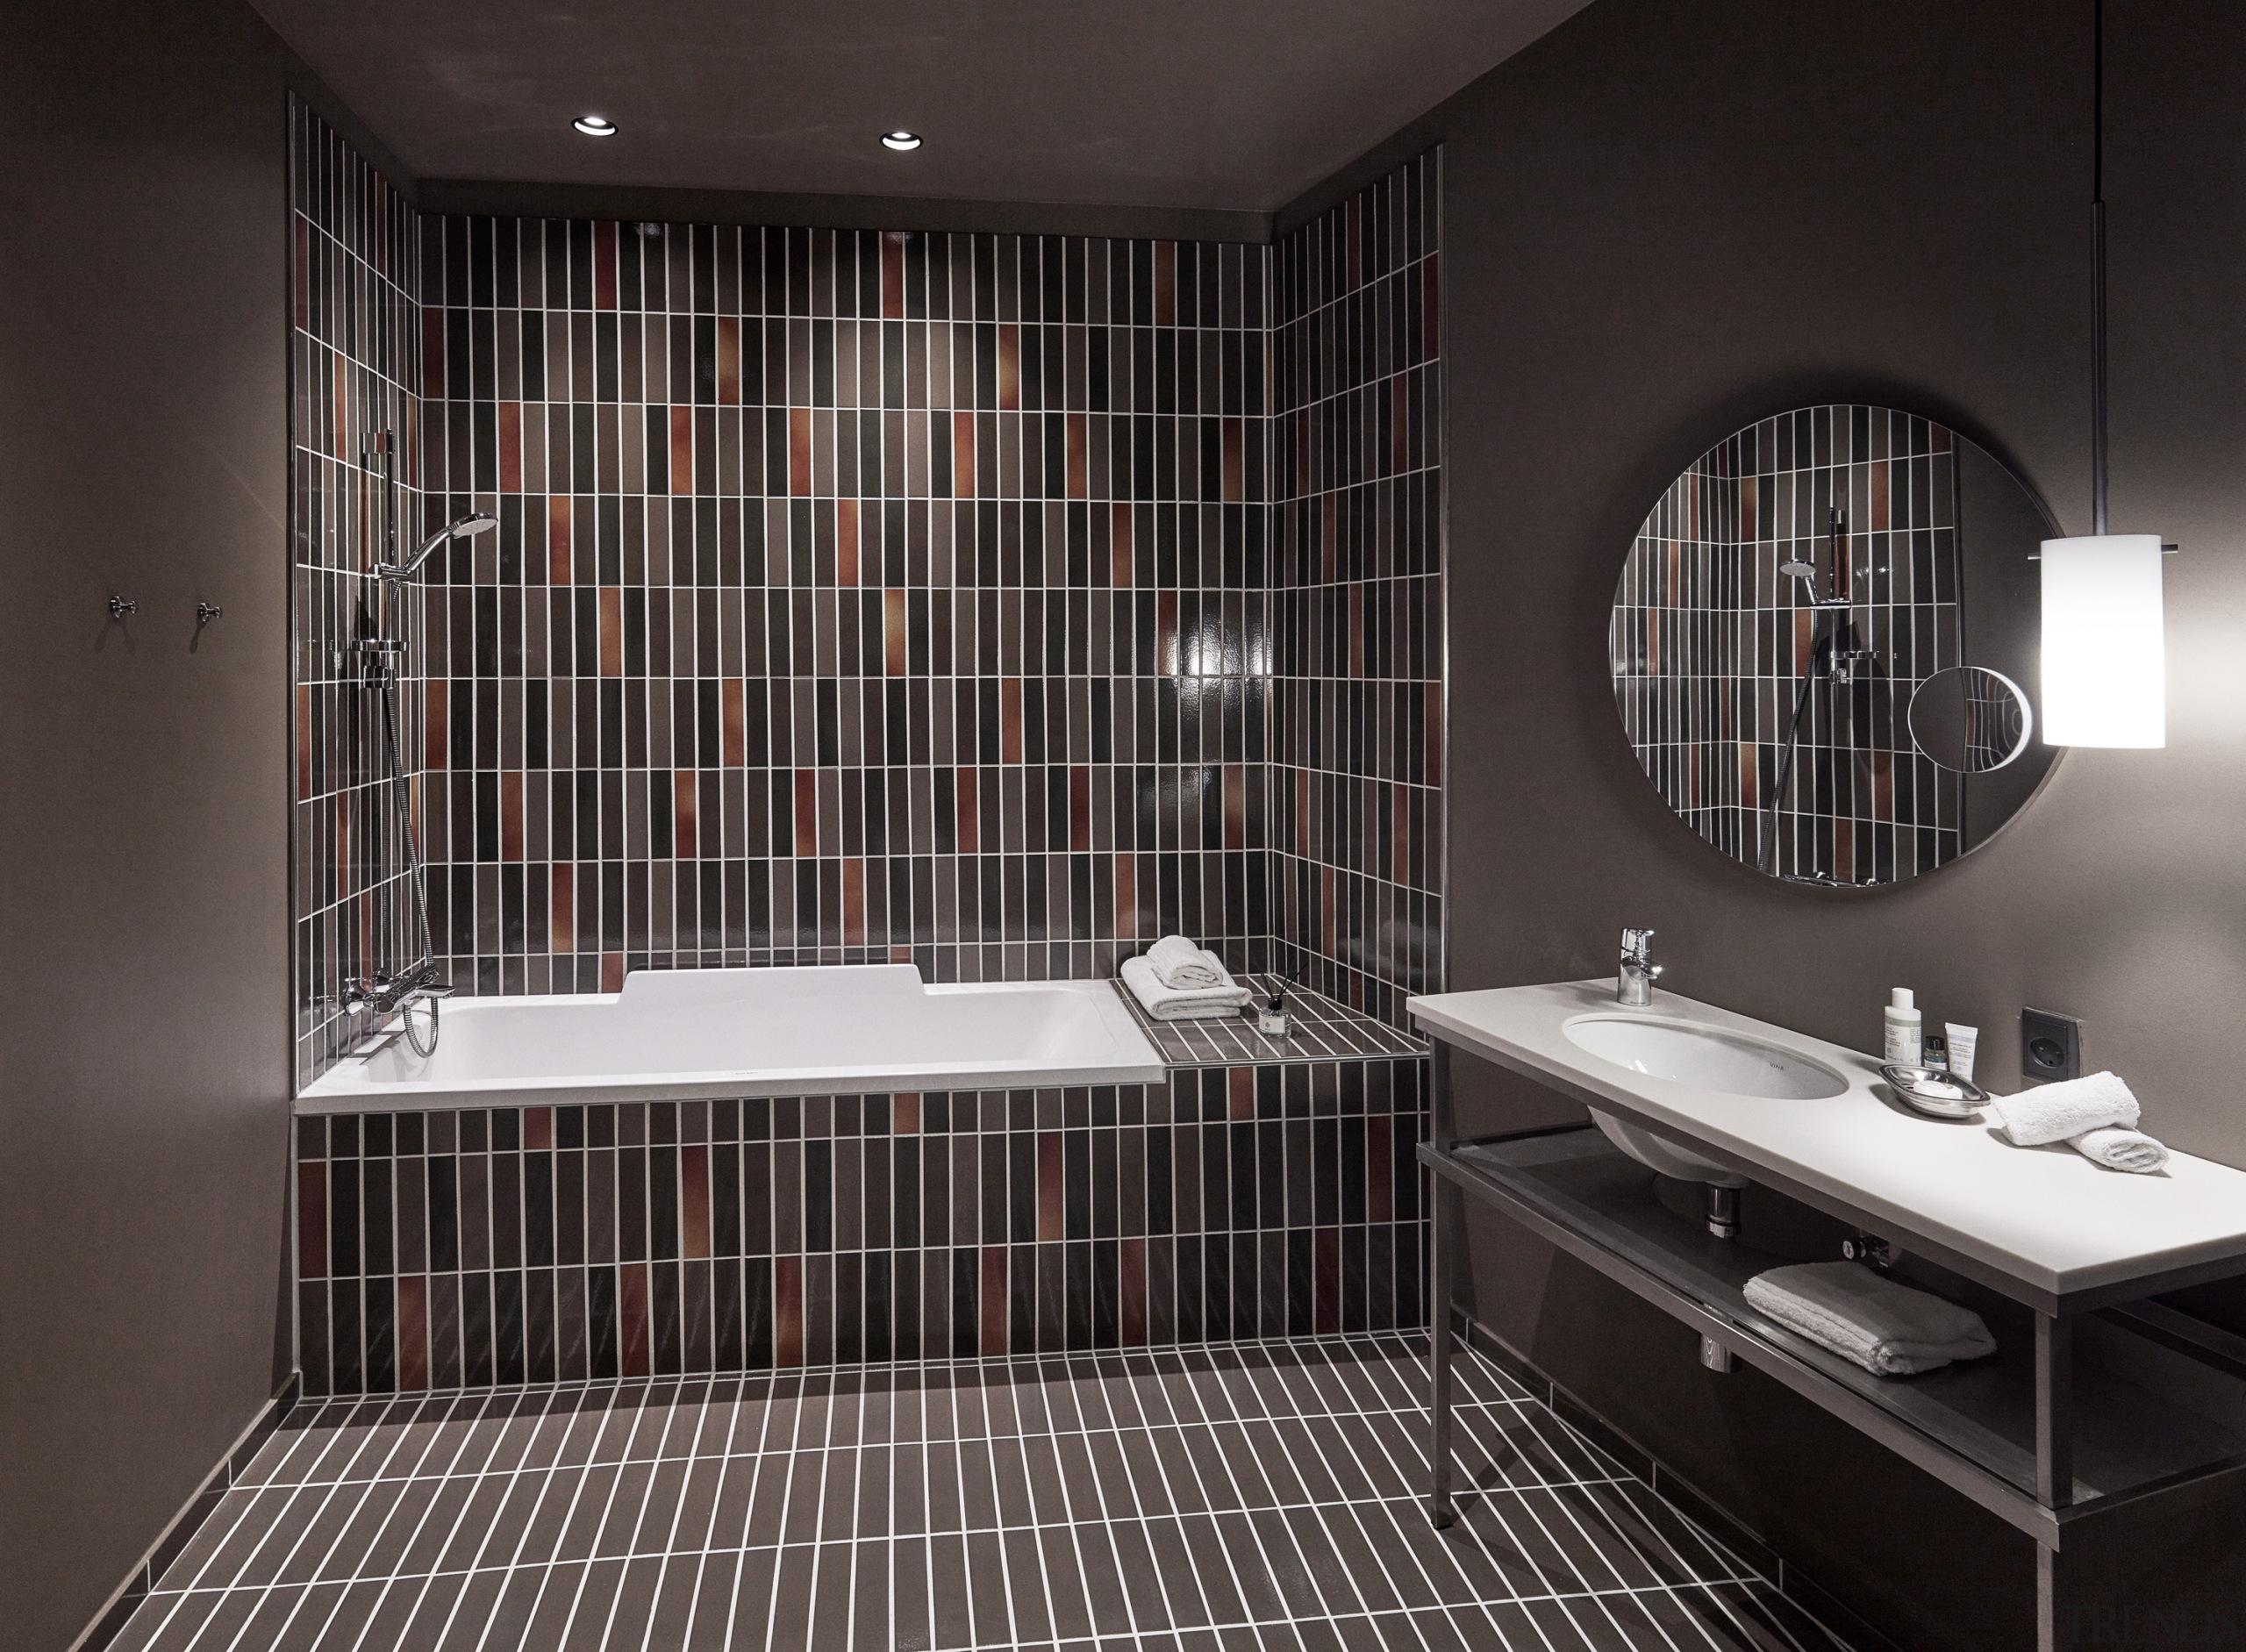 Ceramic tiles from Agrob Buchtal's Craft series adorn architecture, bathroom, black, ceiling, ceramic, floor, flooring, interior design, plumbing fixture, property, room, sink, tap, tile, black